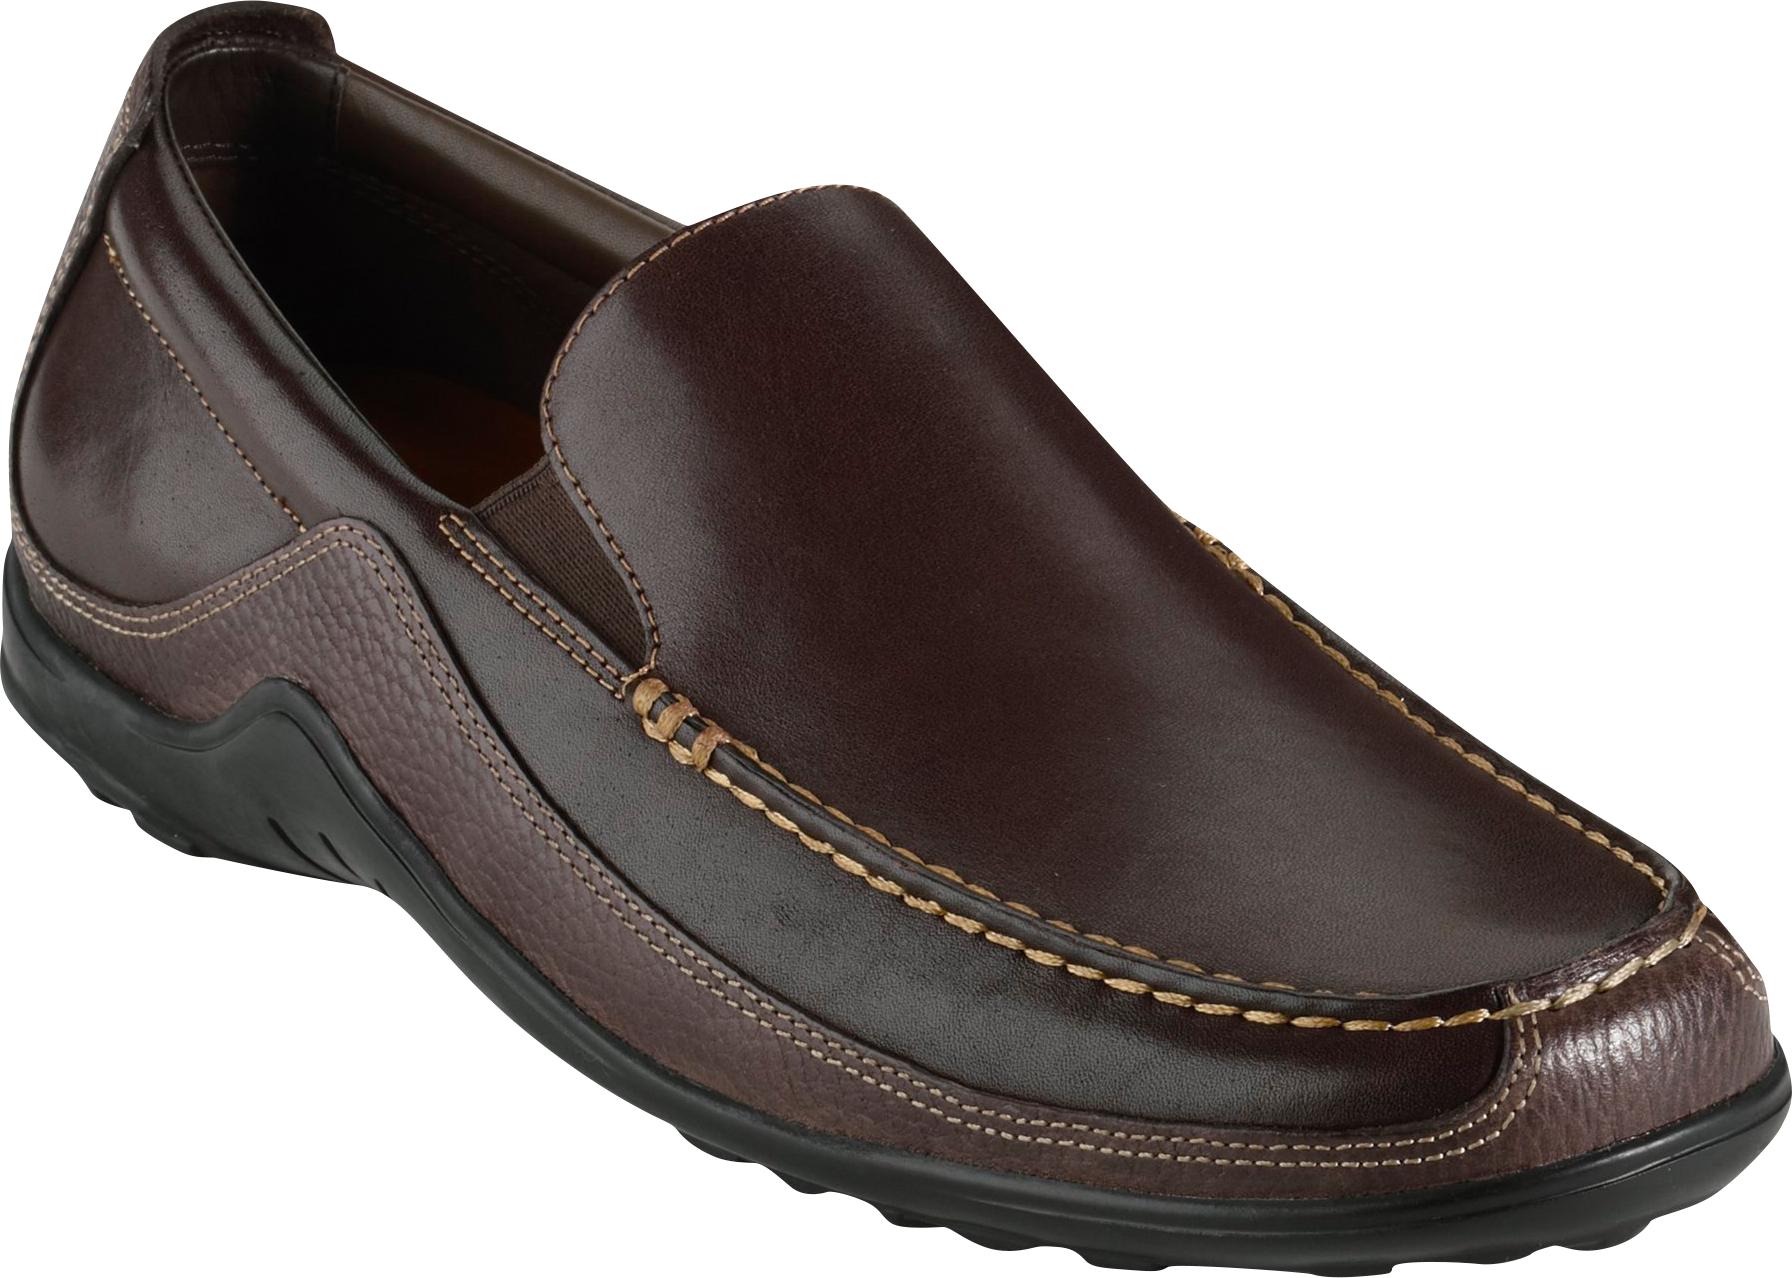 938a378d757 Tucker Venetian Shoes by Cole Haan - Cole Haan